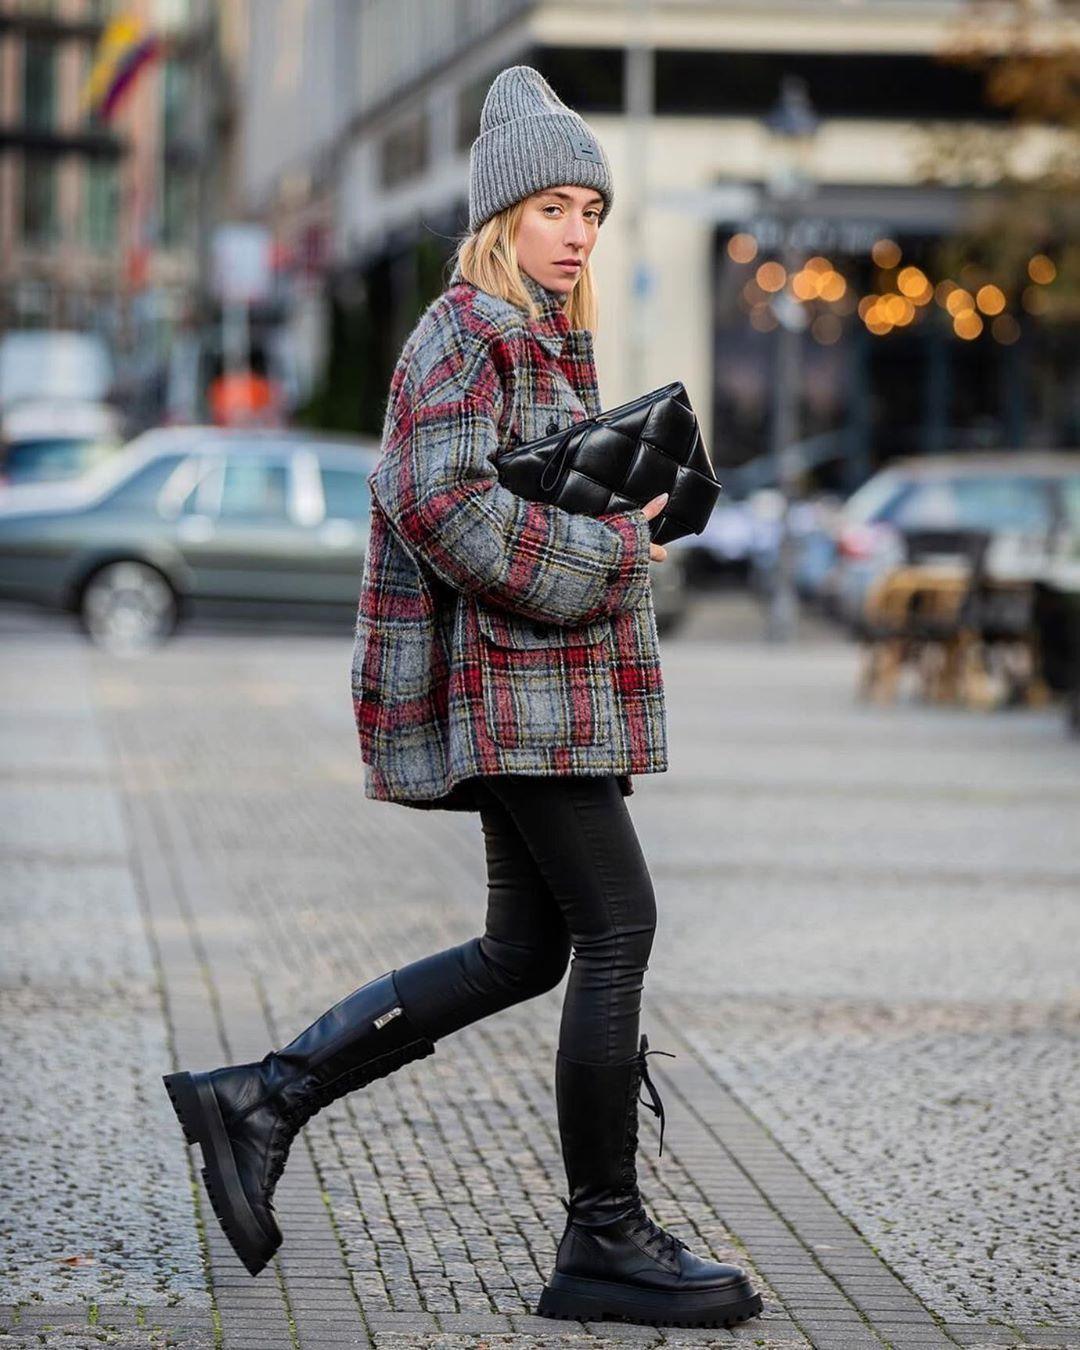 "Sonia Lyson on Instagram: ""Grey Saturdays in the city 🌪 #ootd #saturdays #berlin | Anzeige"""